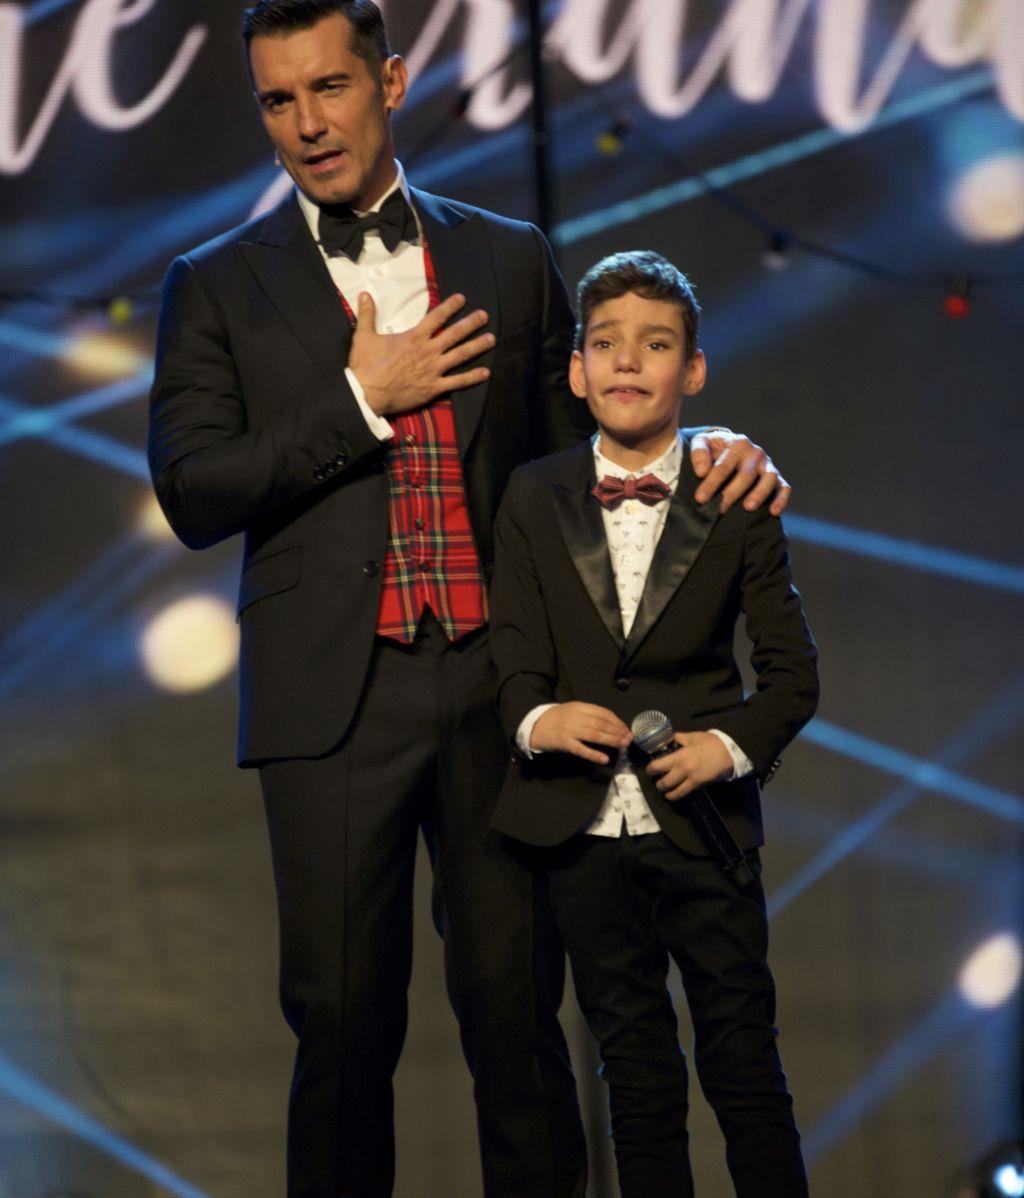 Especial musical de Telecinco con Adrián Martín